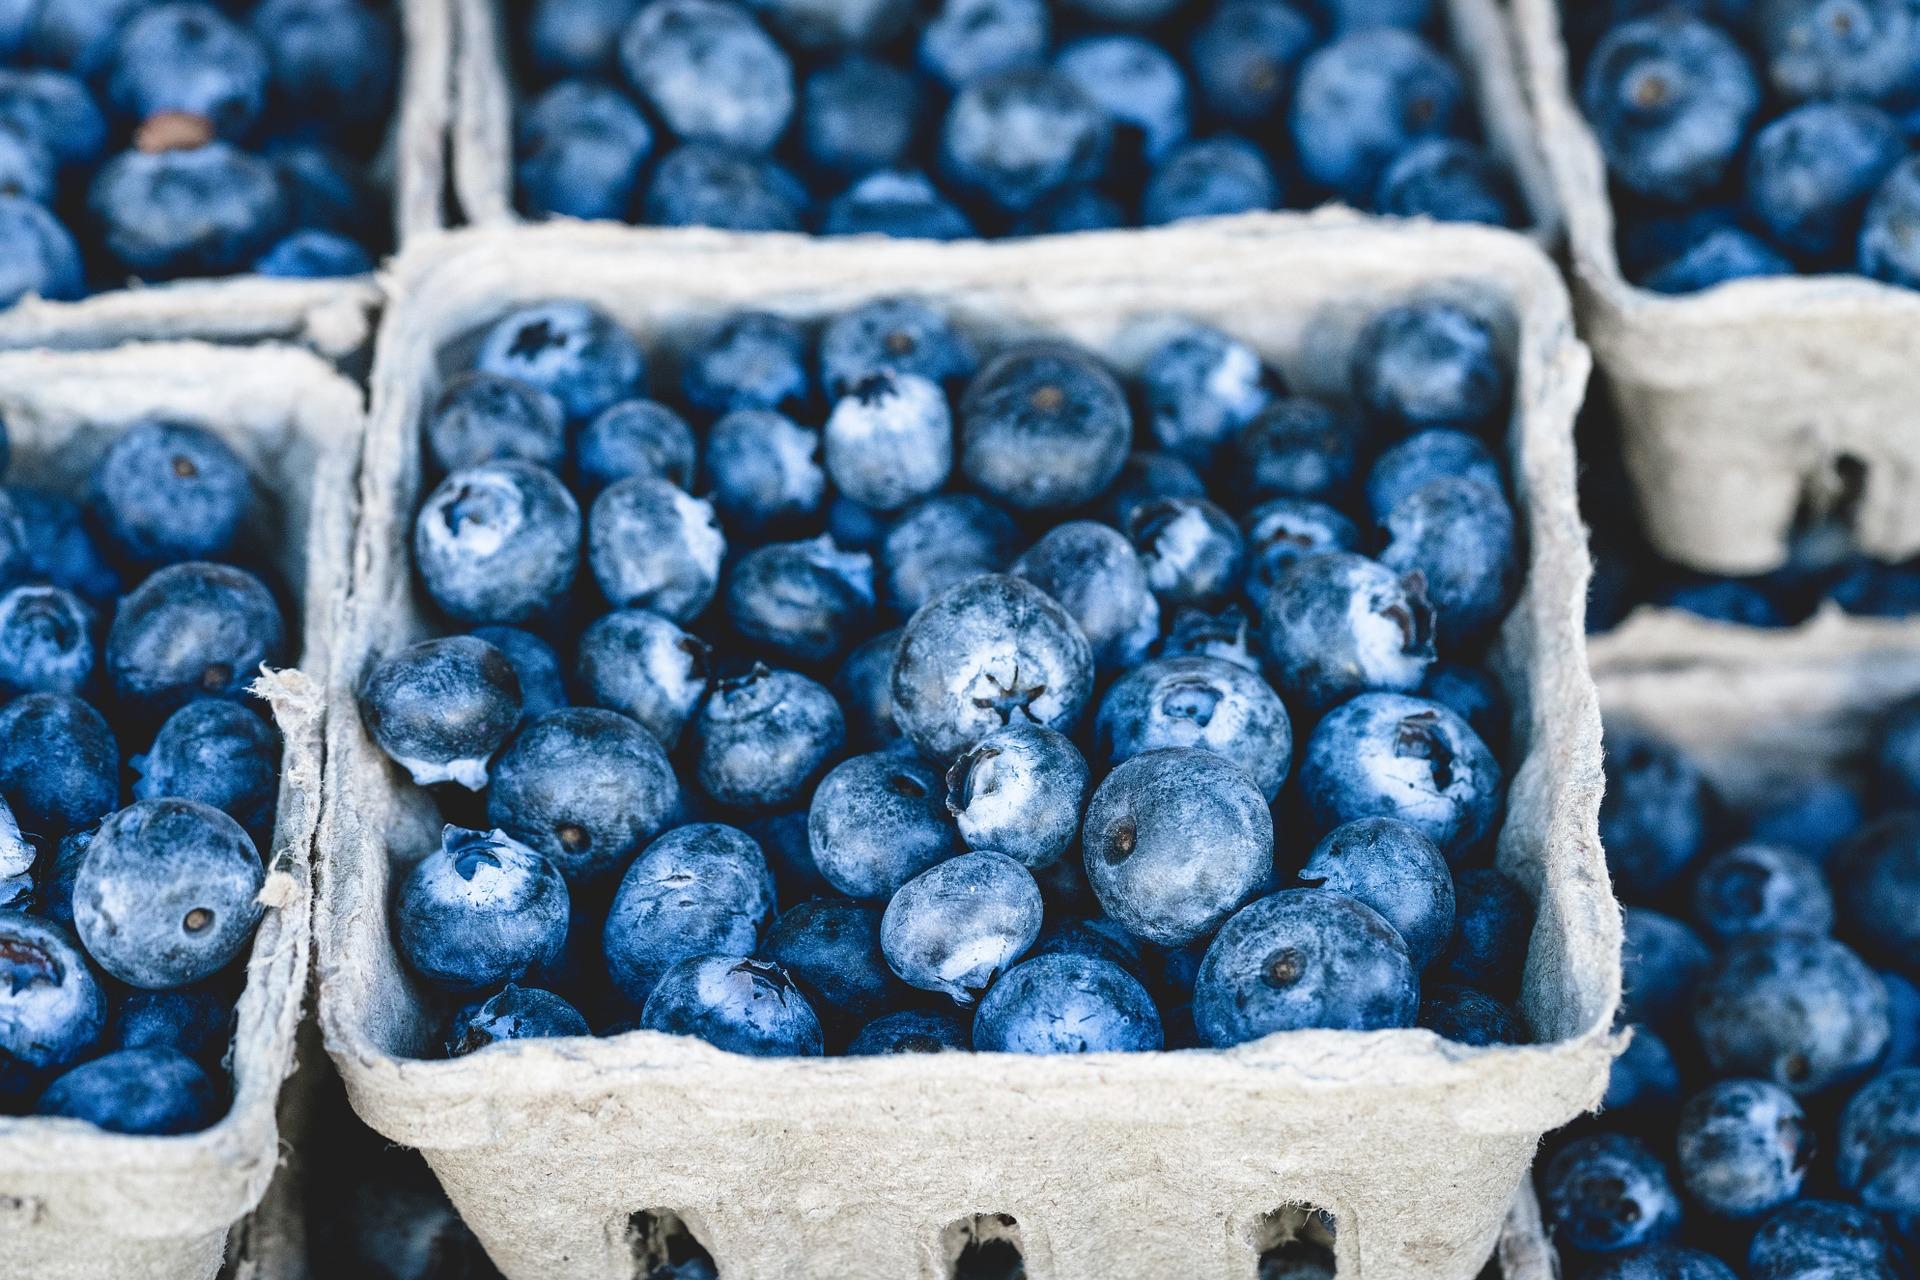 blueberries in carton